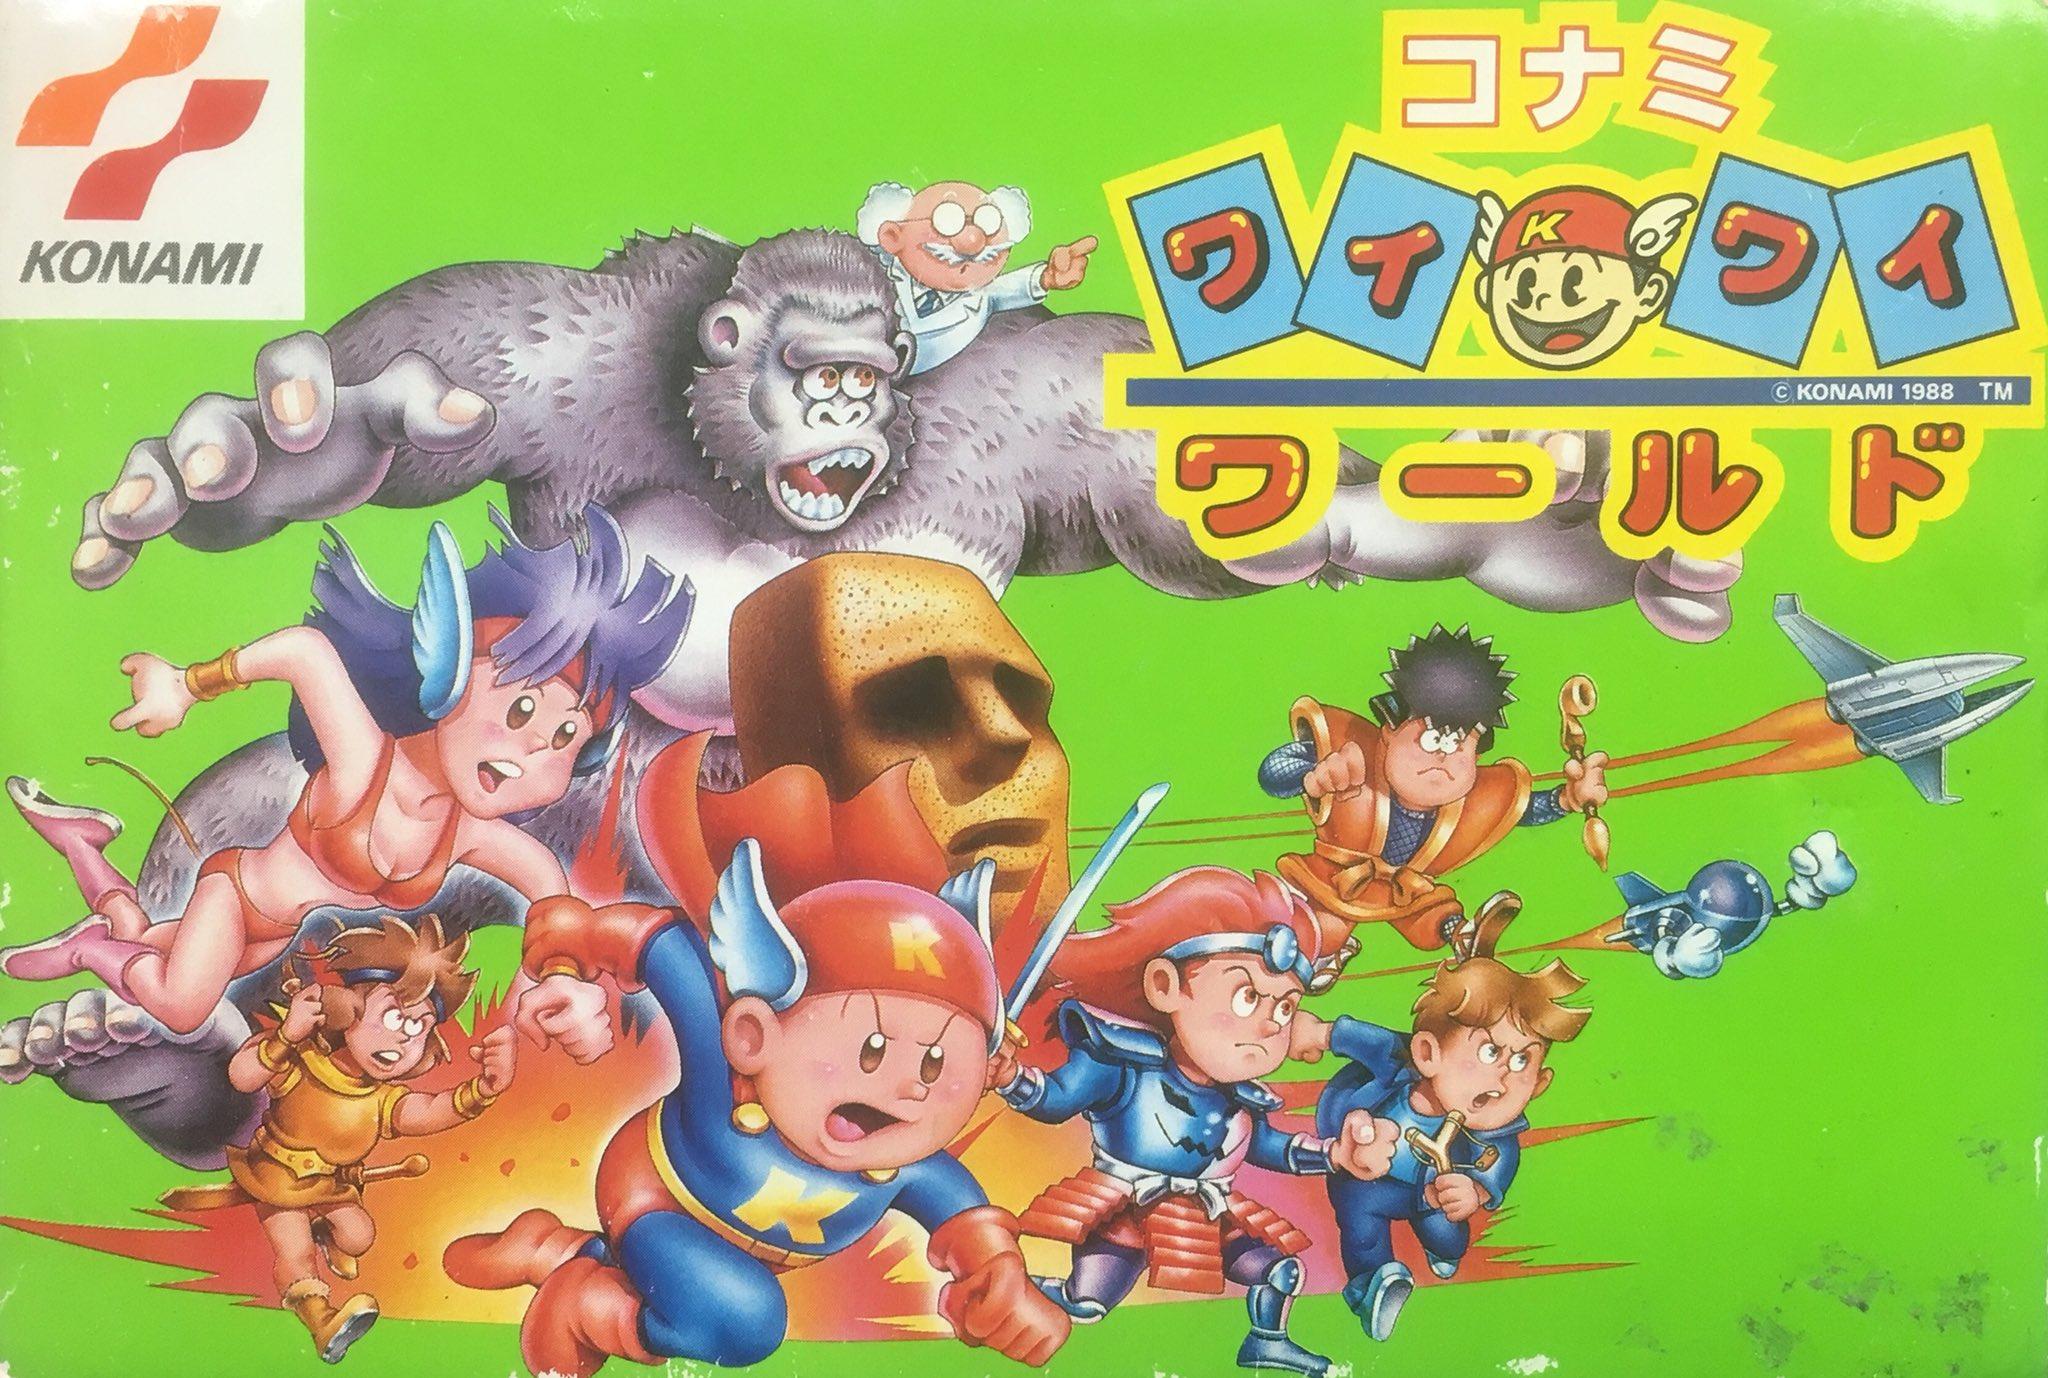 konami wai wai world � strategywiki the video game